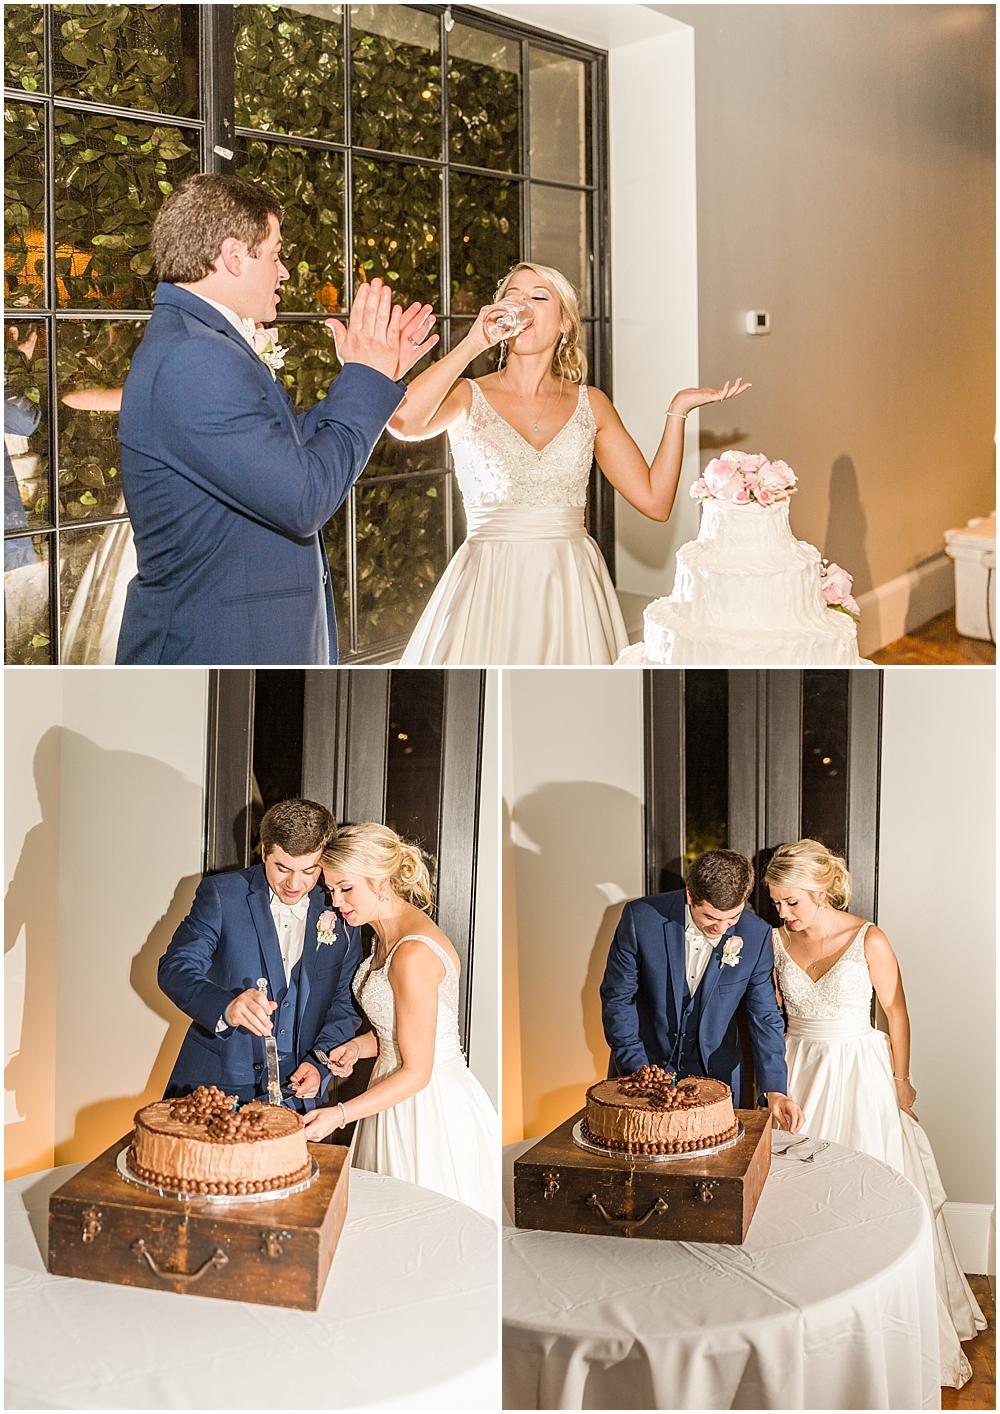 Ashton-Clark-Photography-Wedding-Portrait-Family-Photographer-Mobile-Alabama_0367.jpg